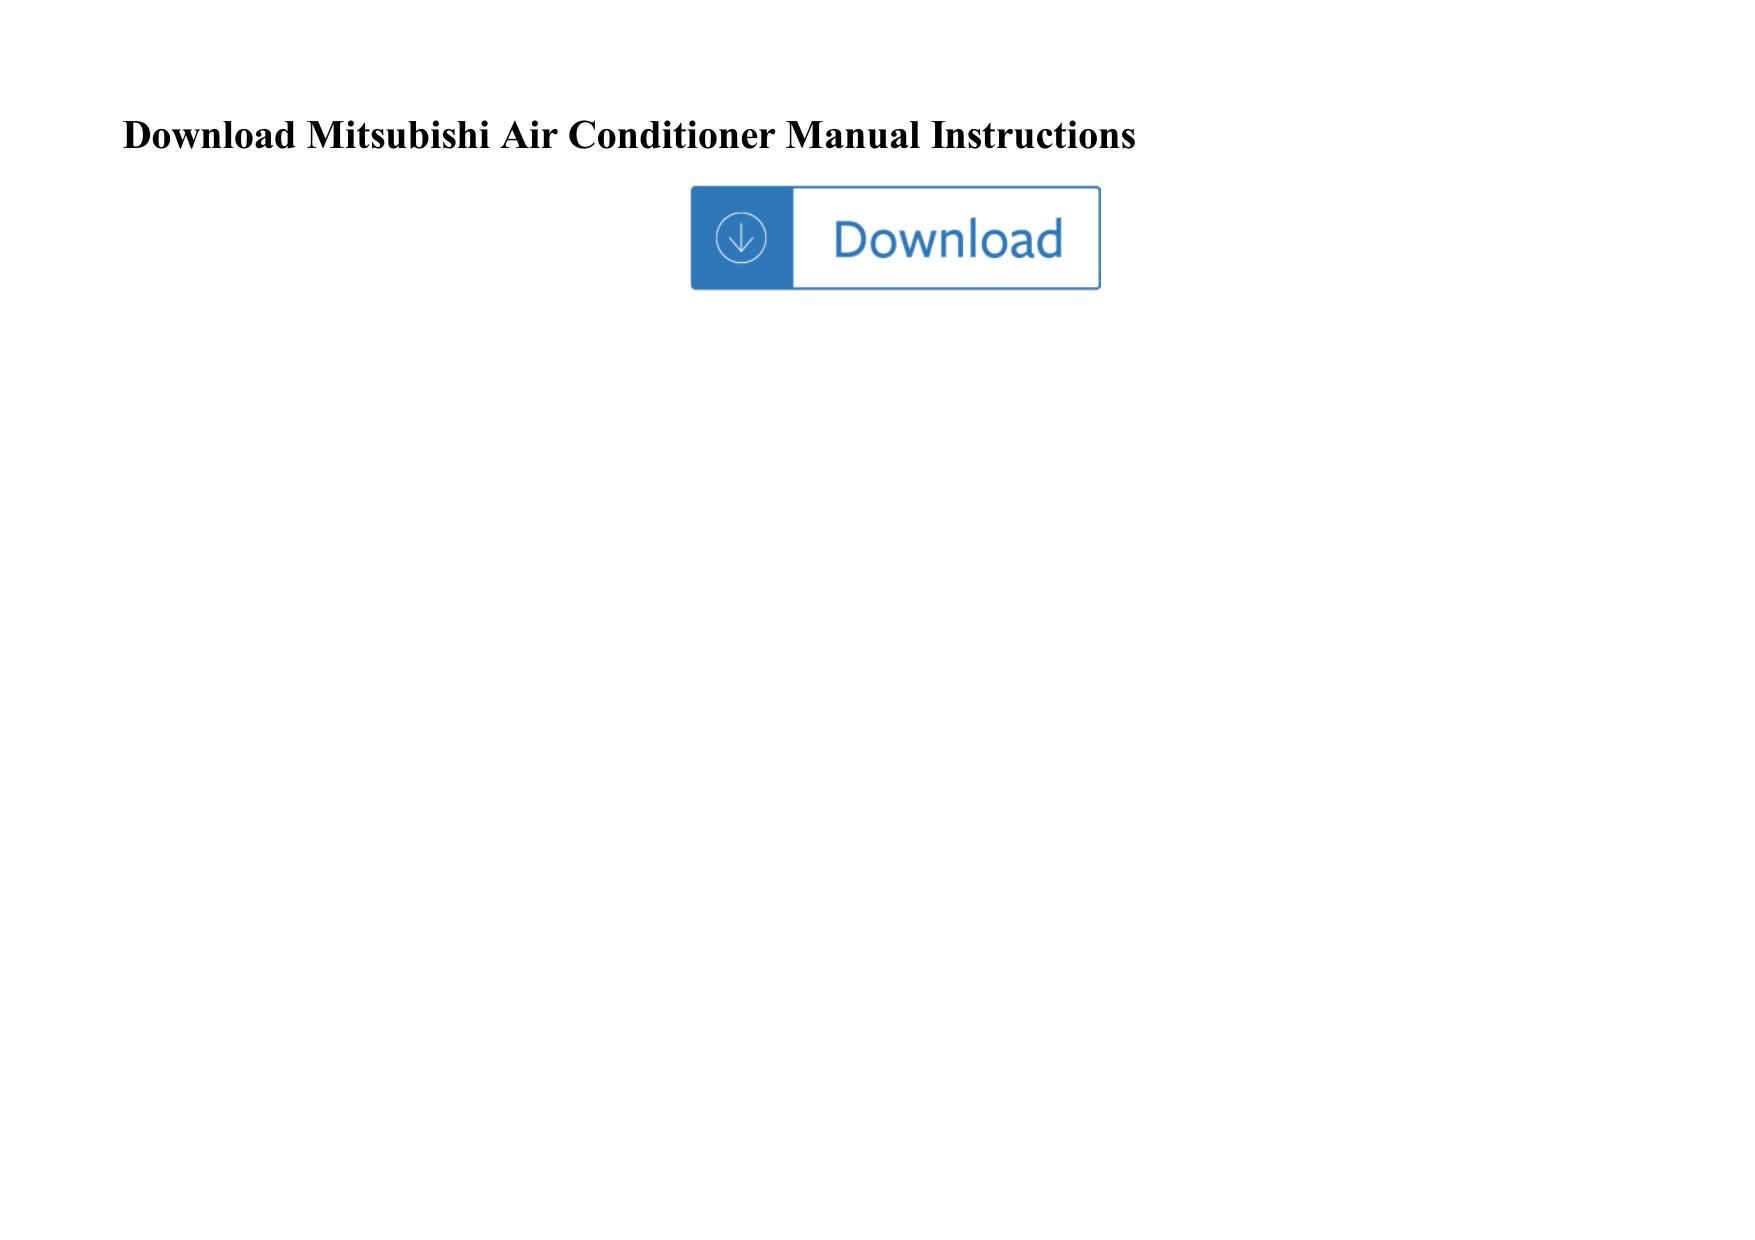 Mitsubishi Air Conditioner Schematic